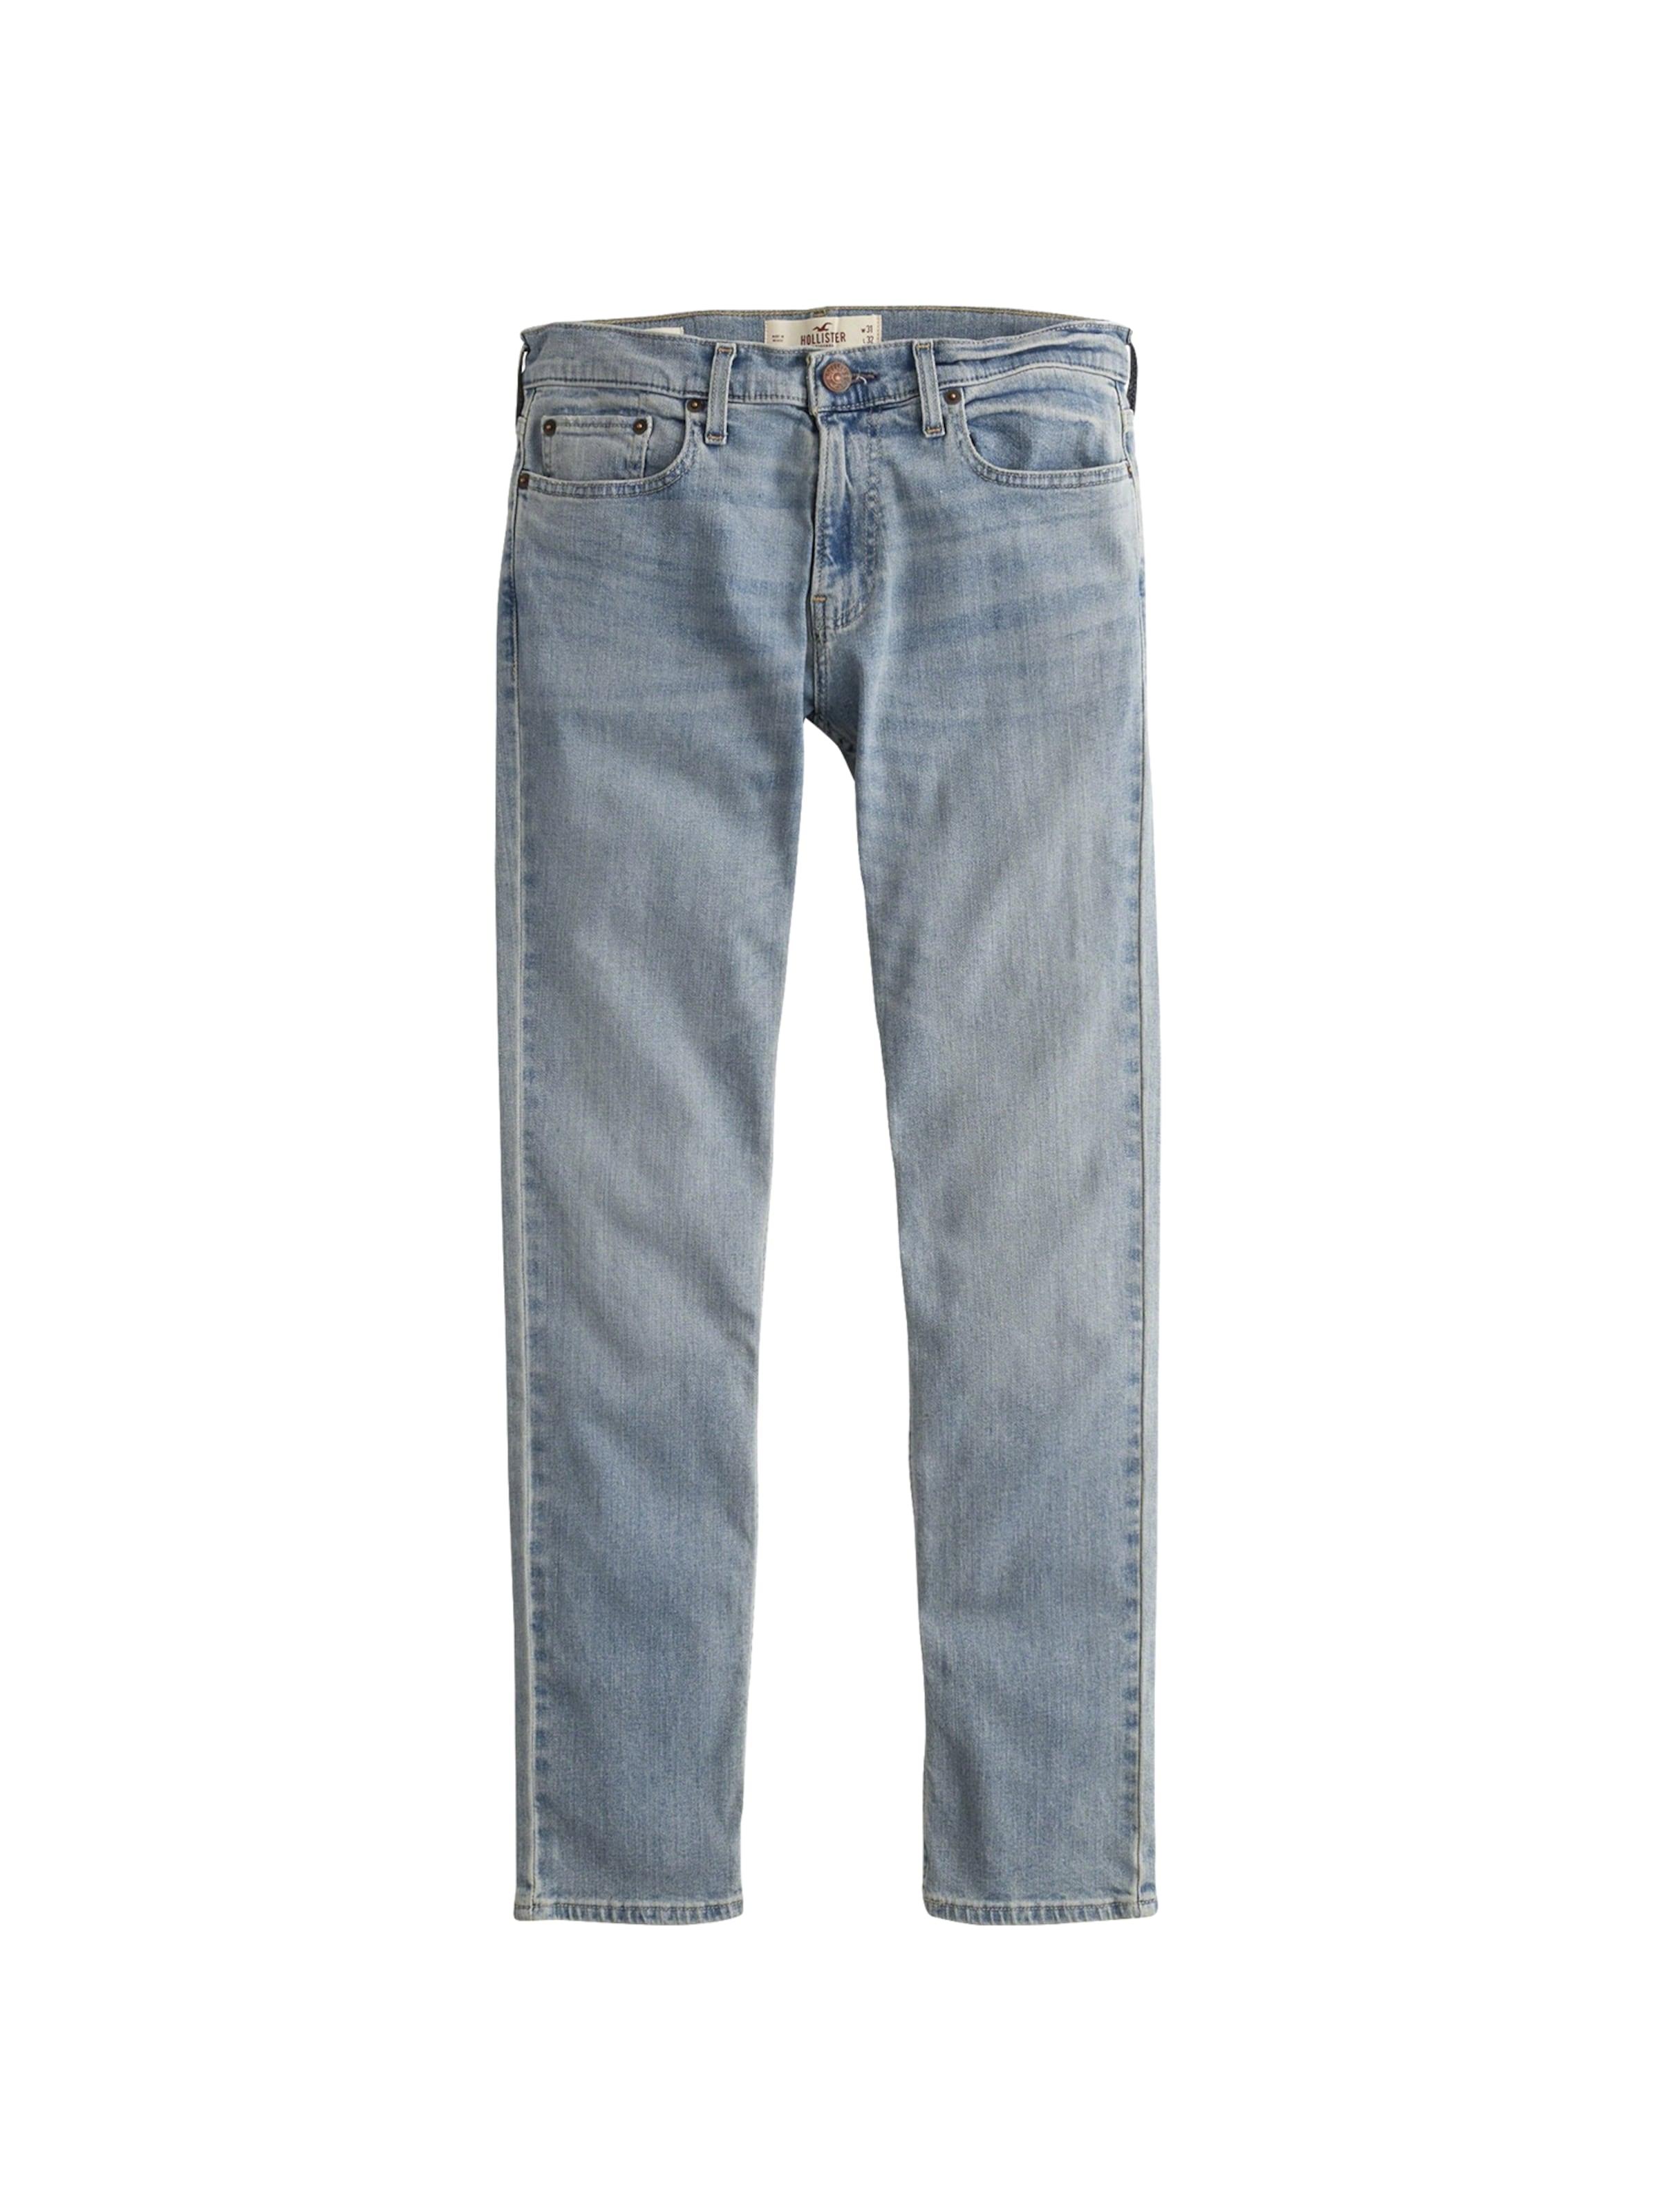 1cc' 'skny Light Hollister Jeans Blue In Denim JTF1clK